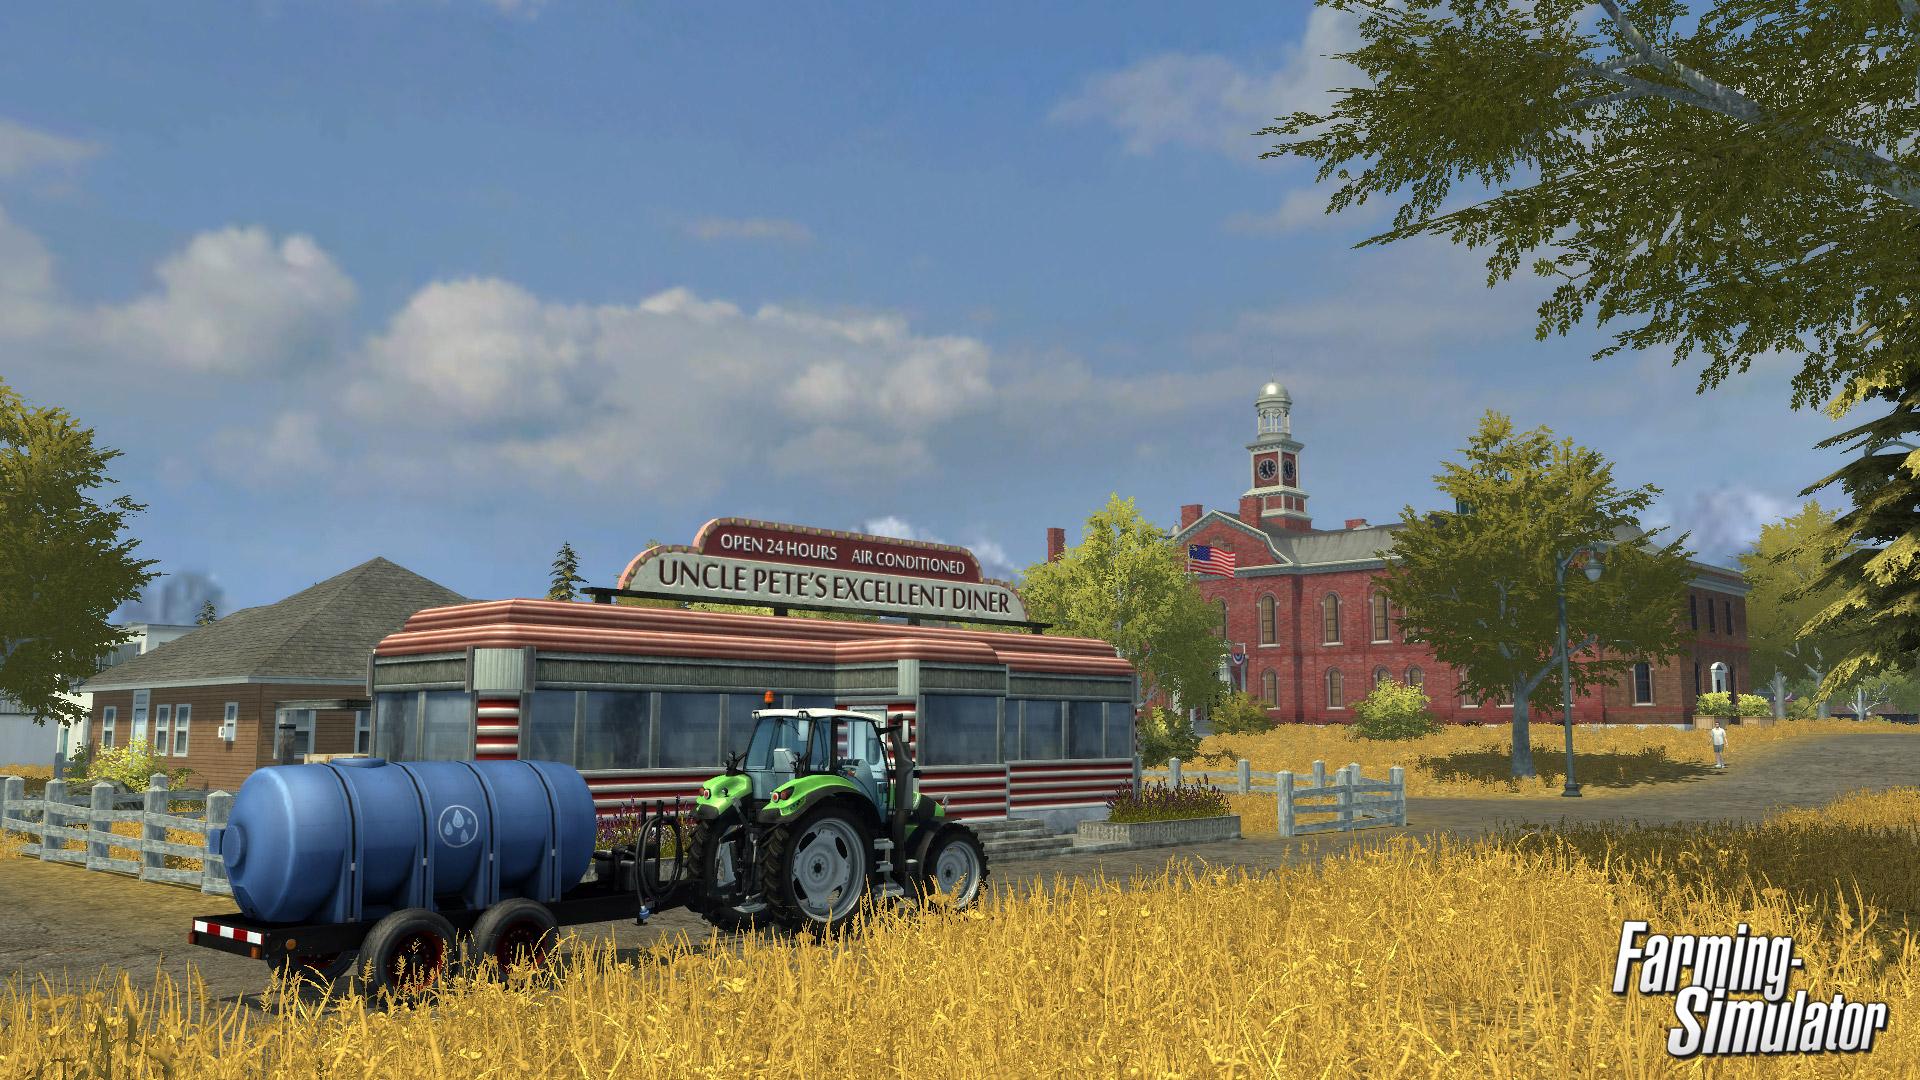 Farming Simulator Wallpaper in 1920x1080